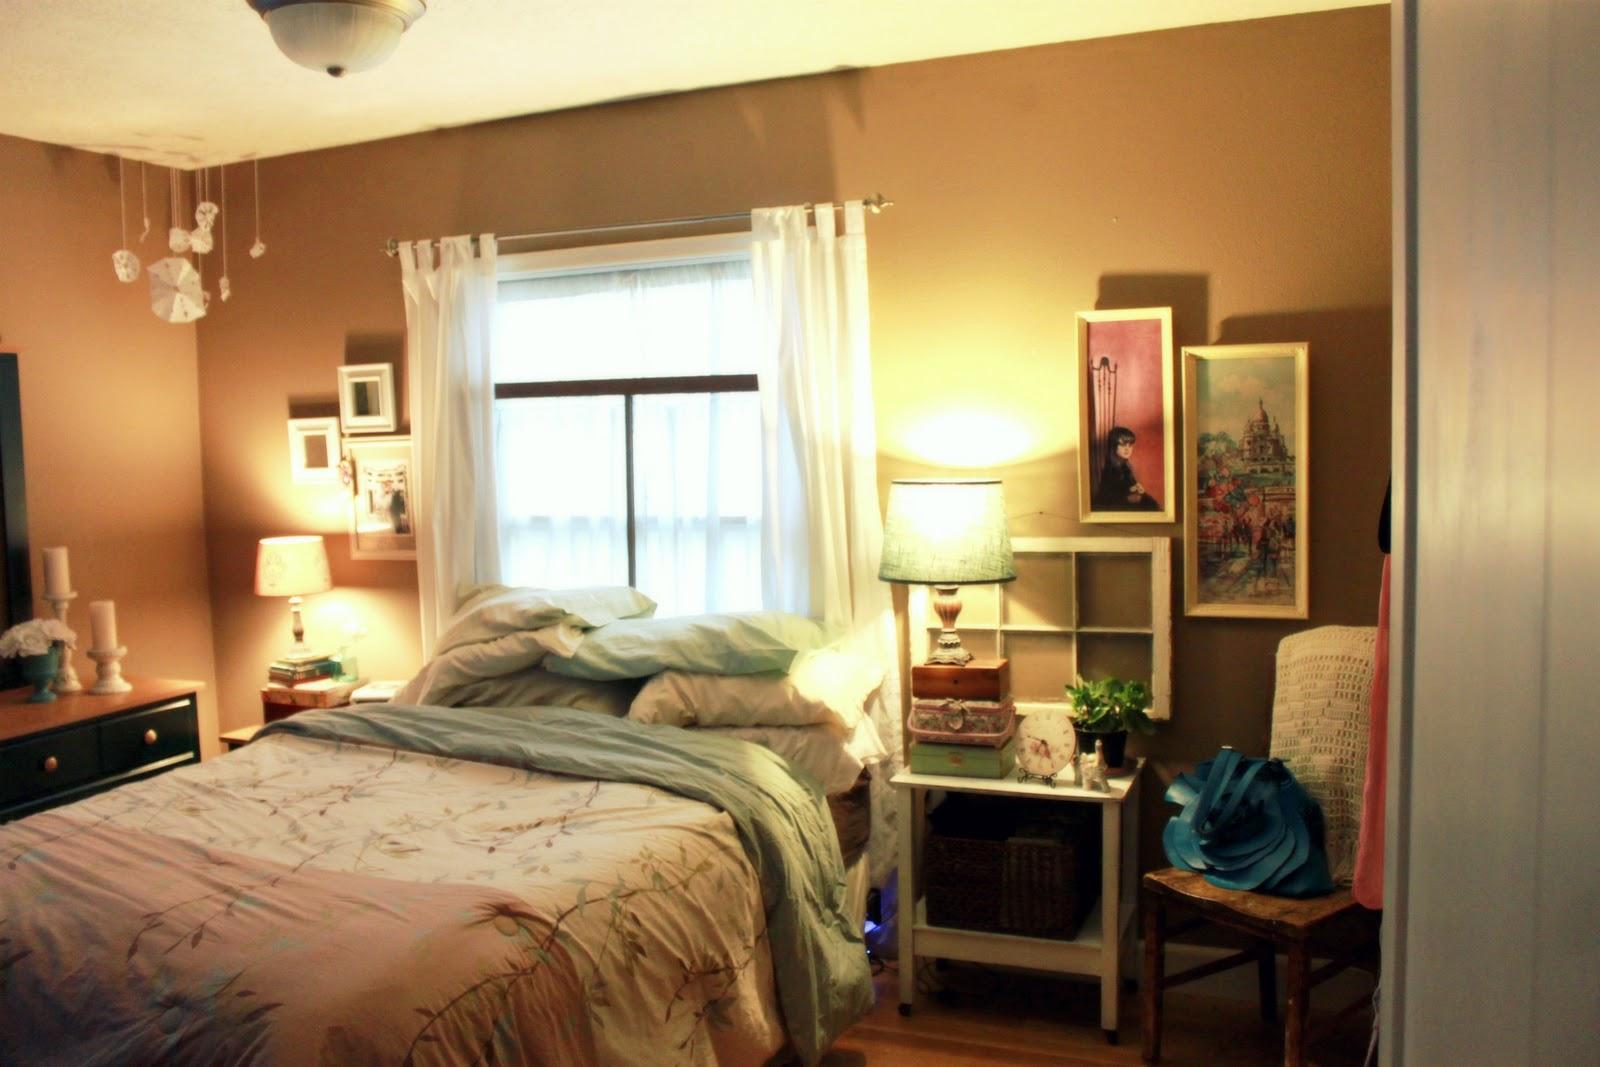 Small bedroom furniture arrangement ideas | Hawk Haven